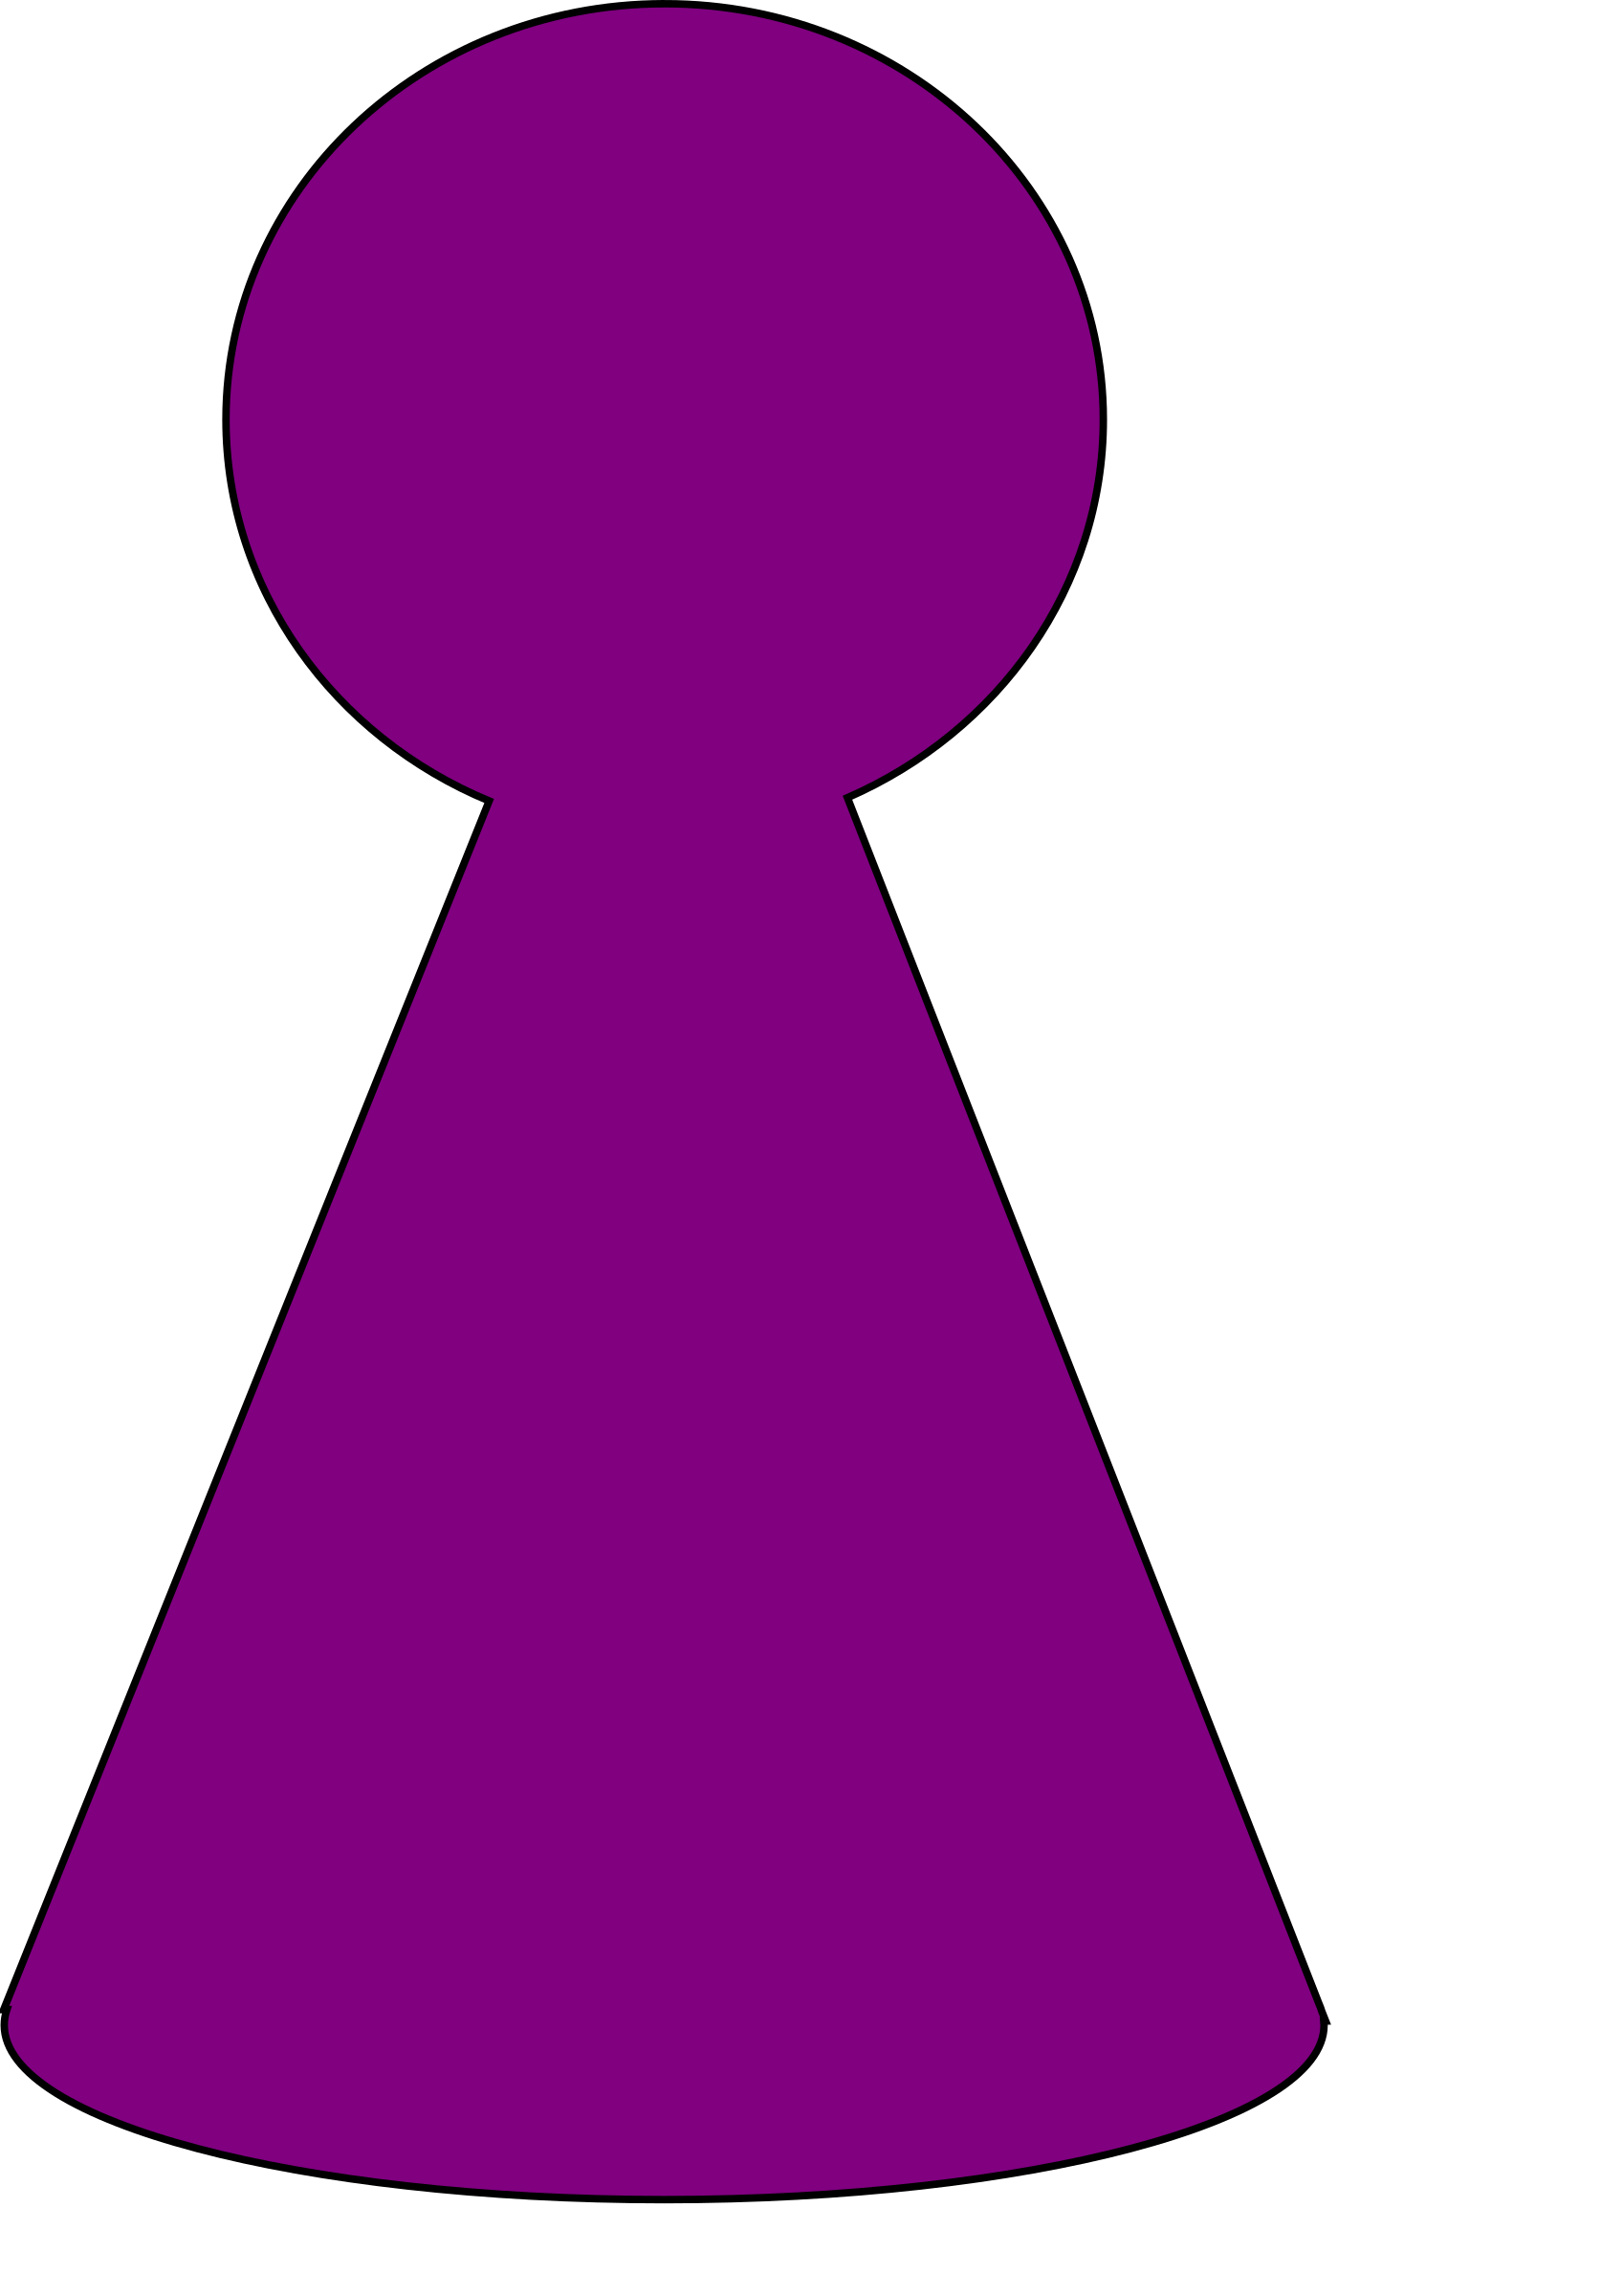 Ludo plum purple big. Games clipart game piece